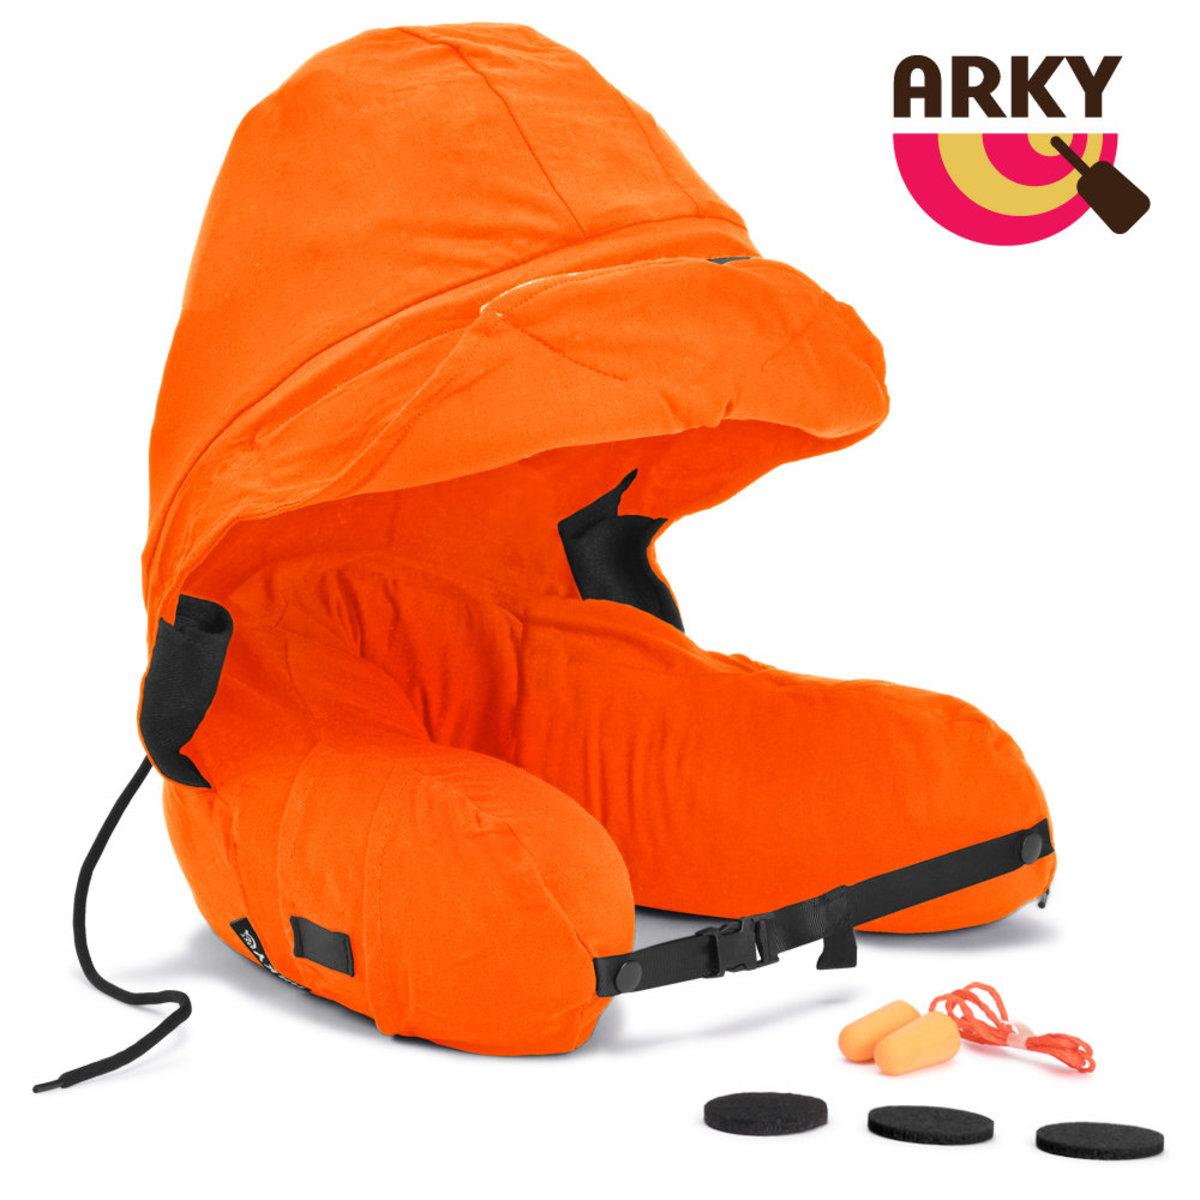 ARKY_Somnus_Travel_Pillow_Air_02o